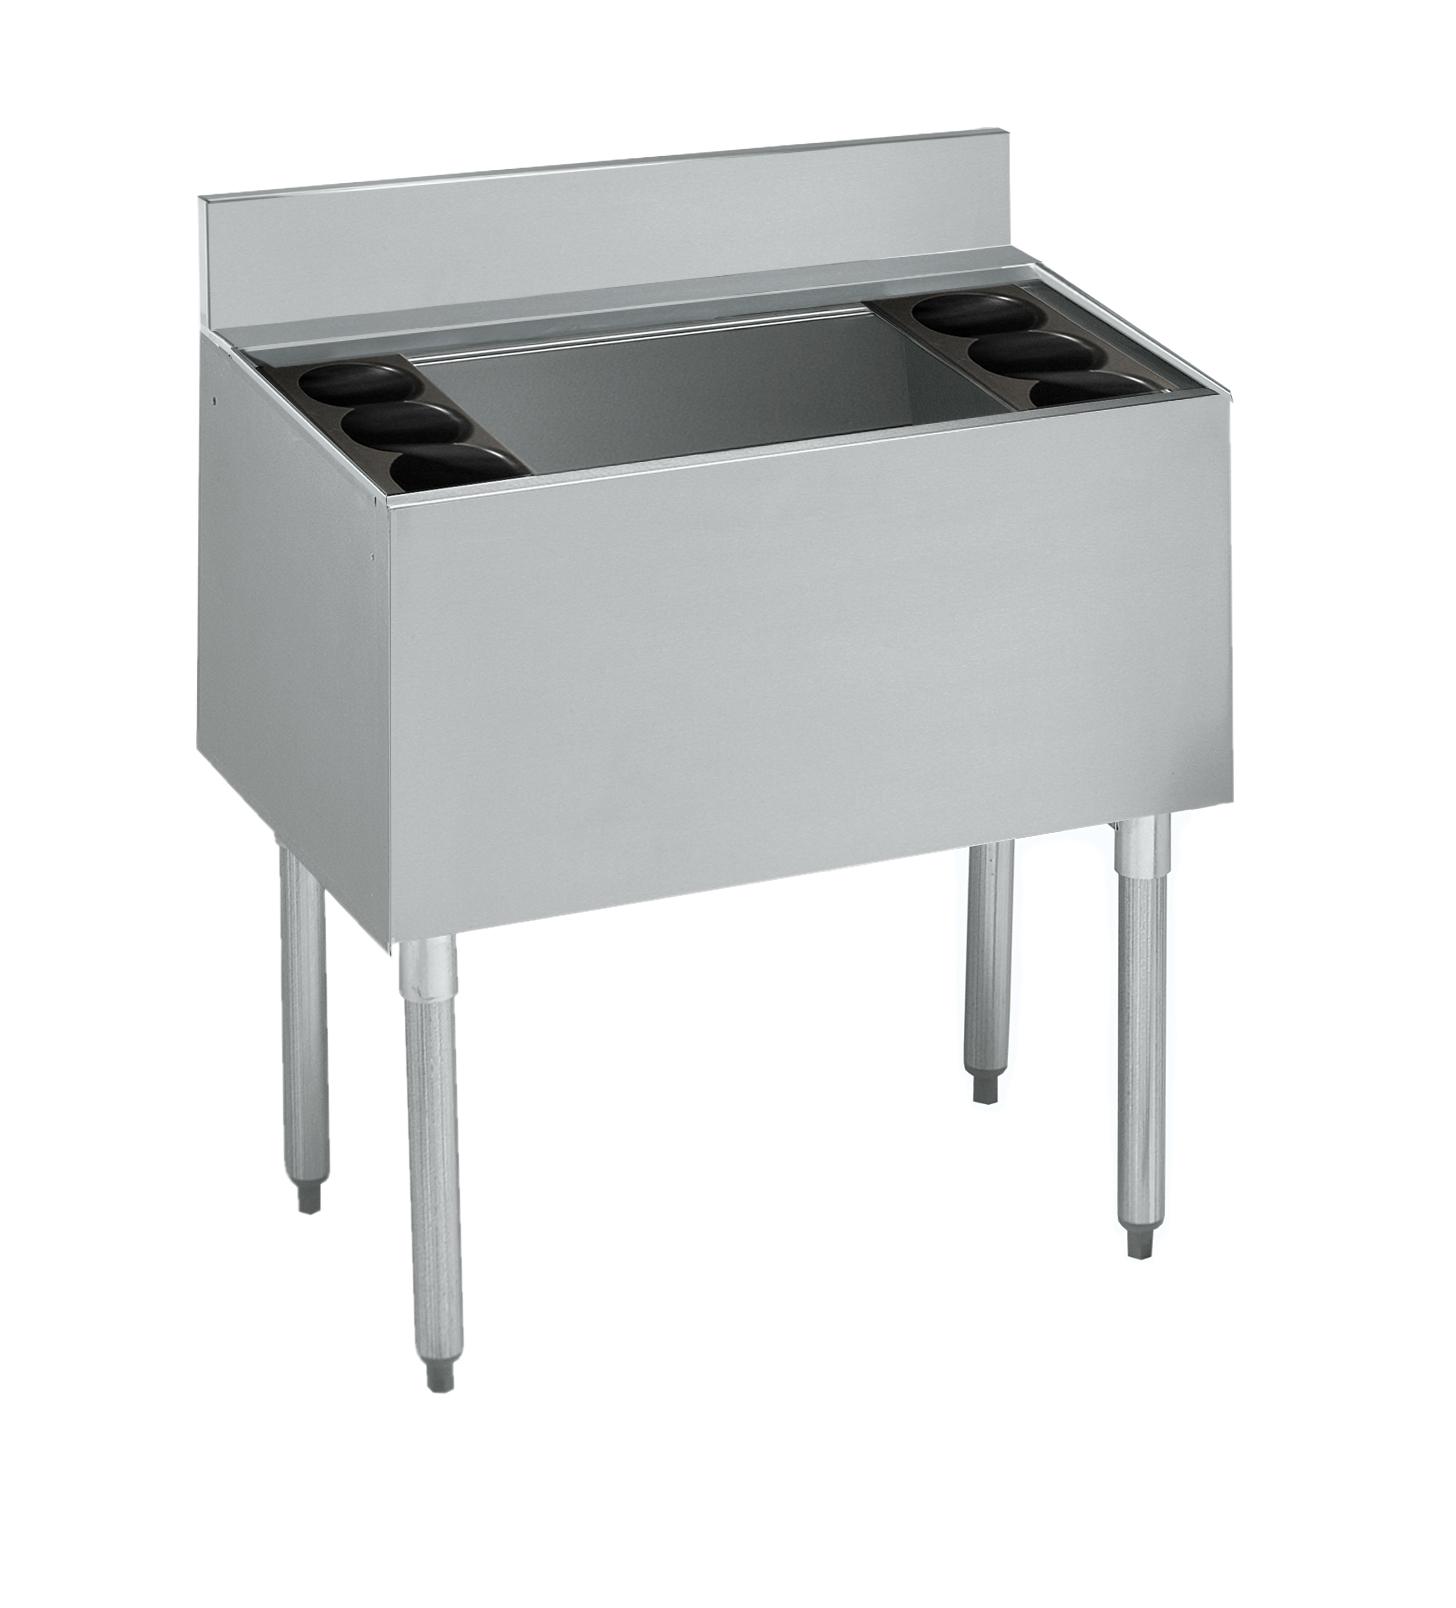 Krowne Metal 21-30-7 underbar ice bin/cocktail unit